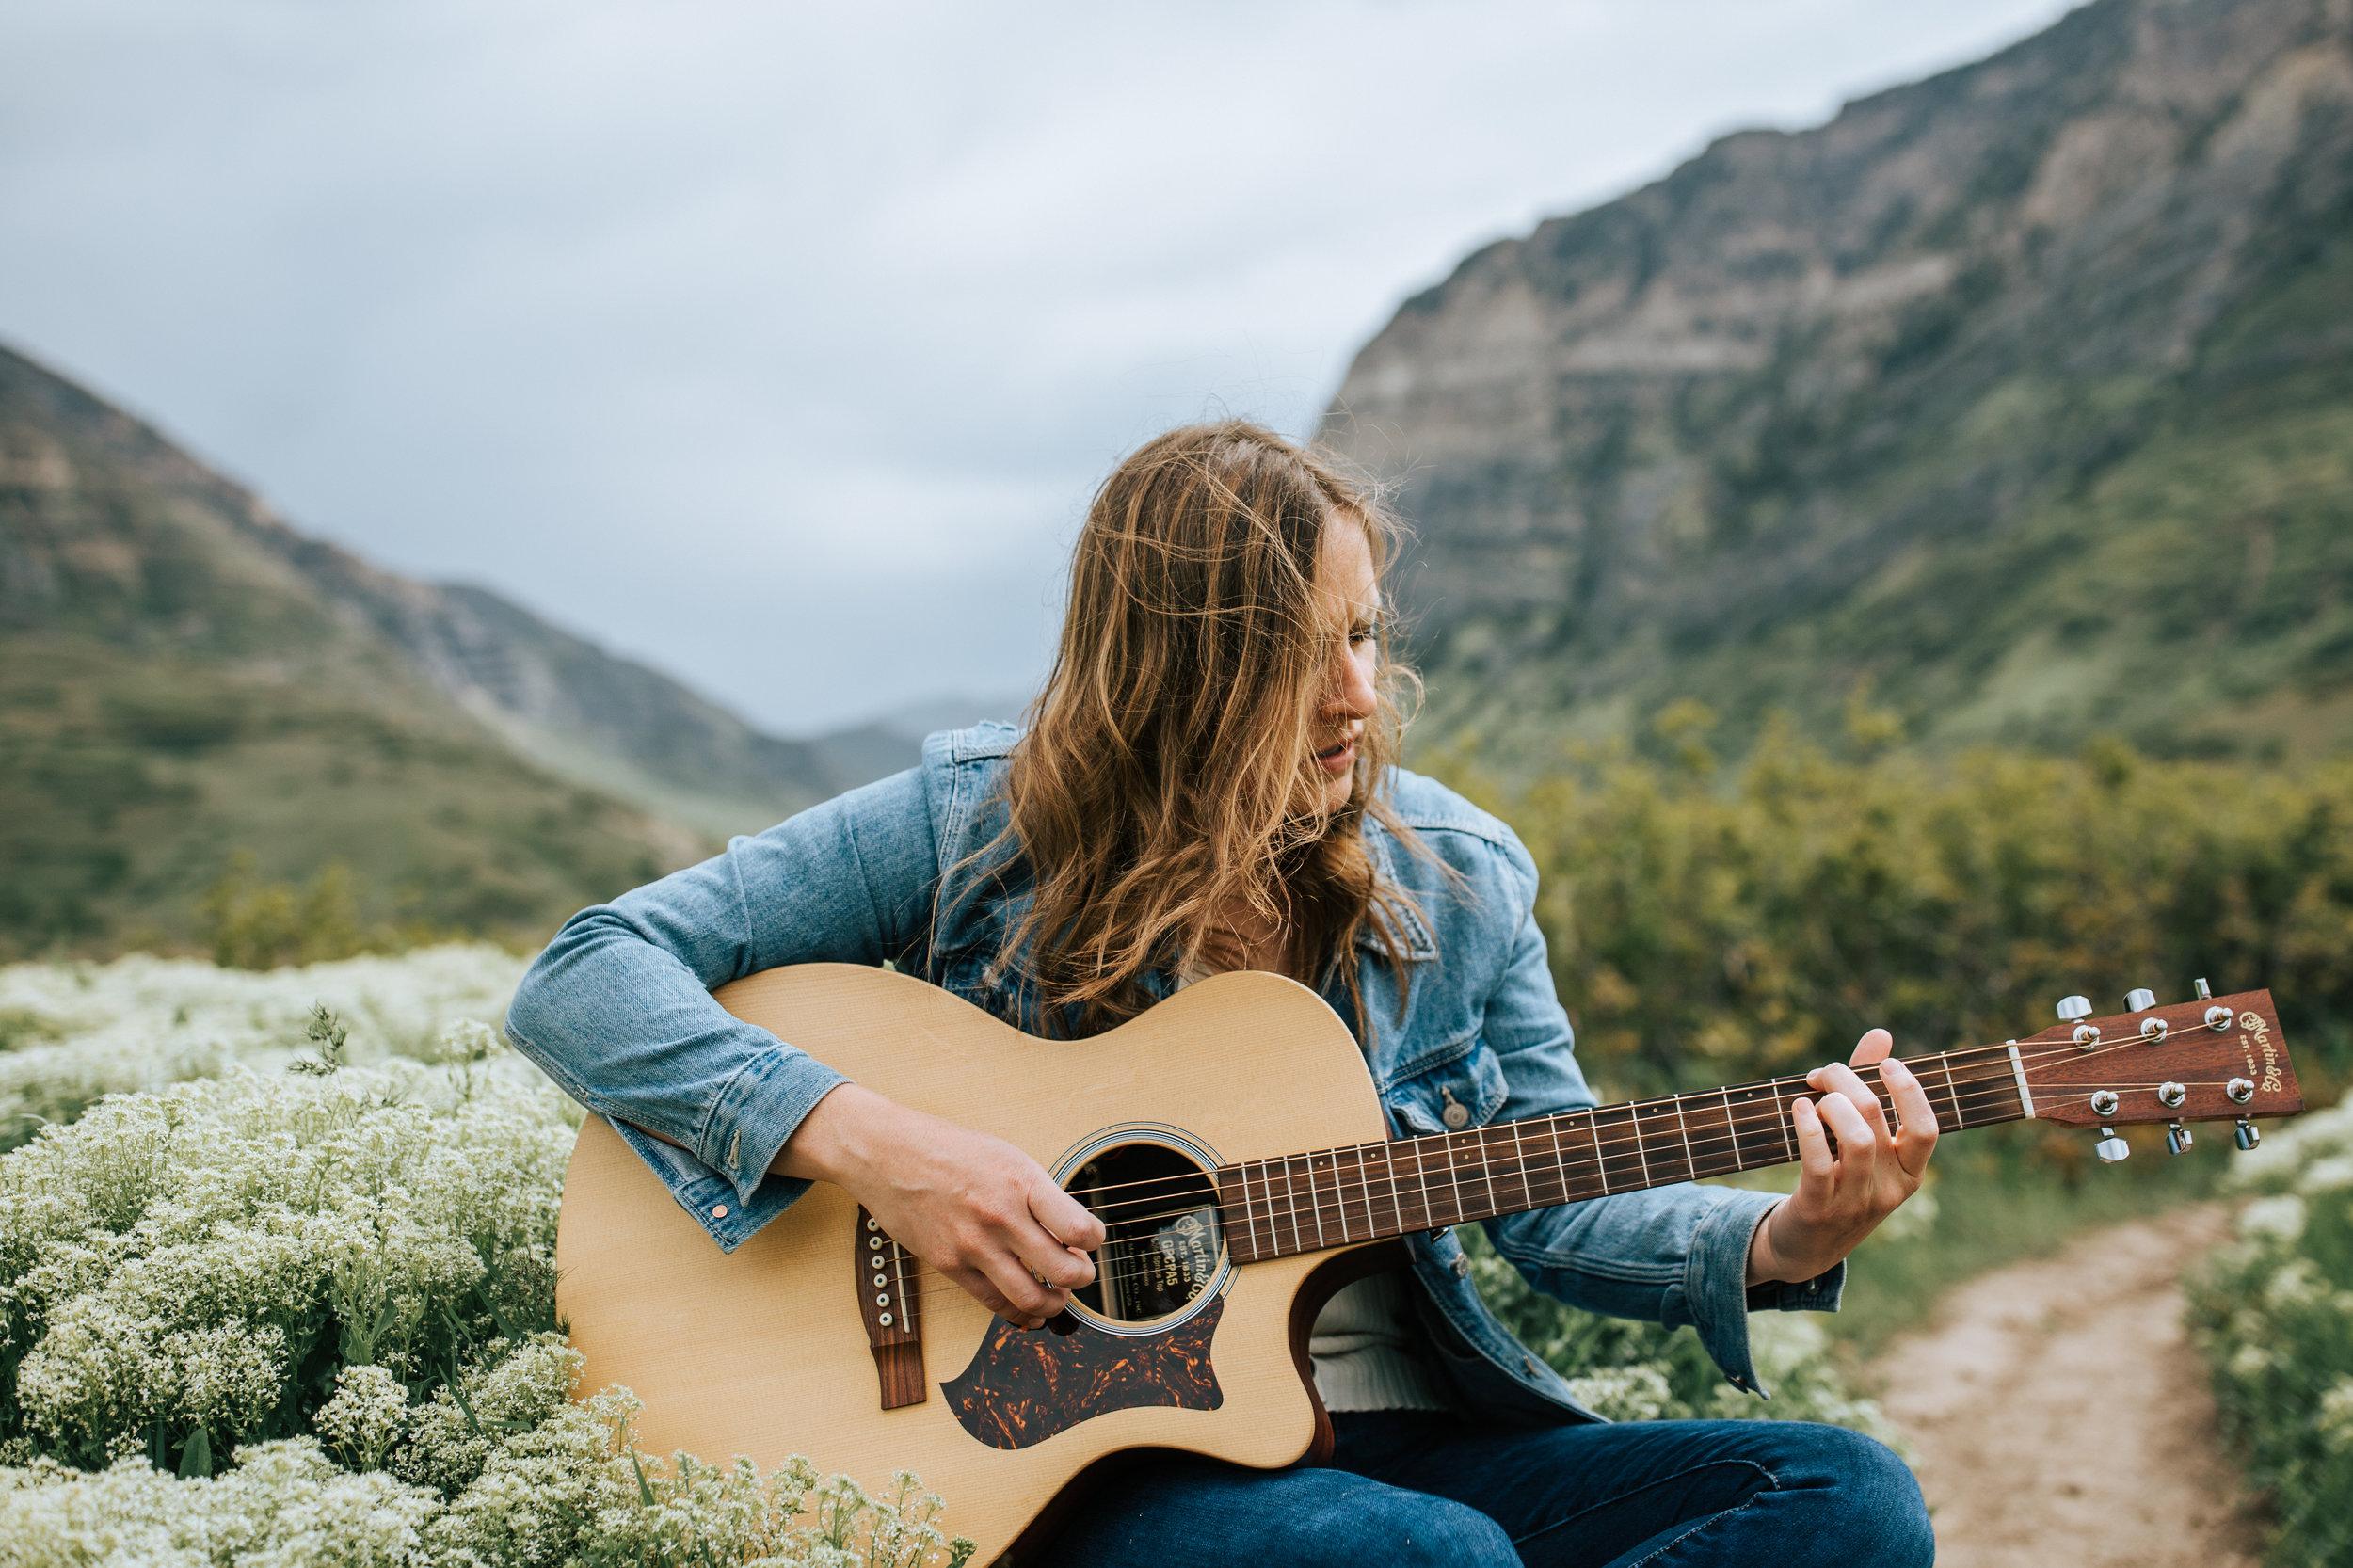 Windy mountain wildfloWindy mountain wildflower portraits guitar wer portraits guitar